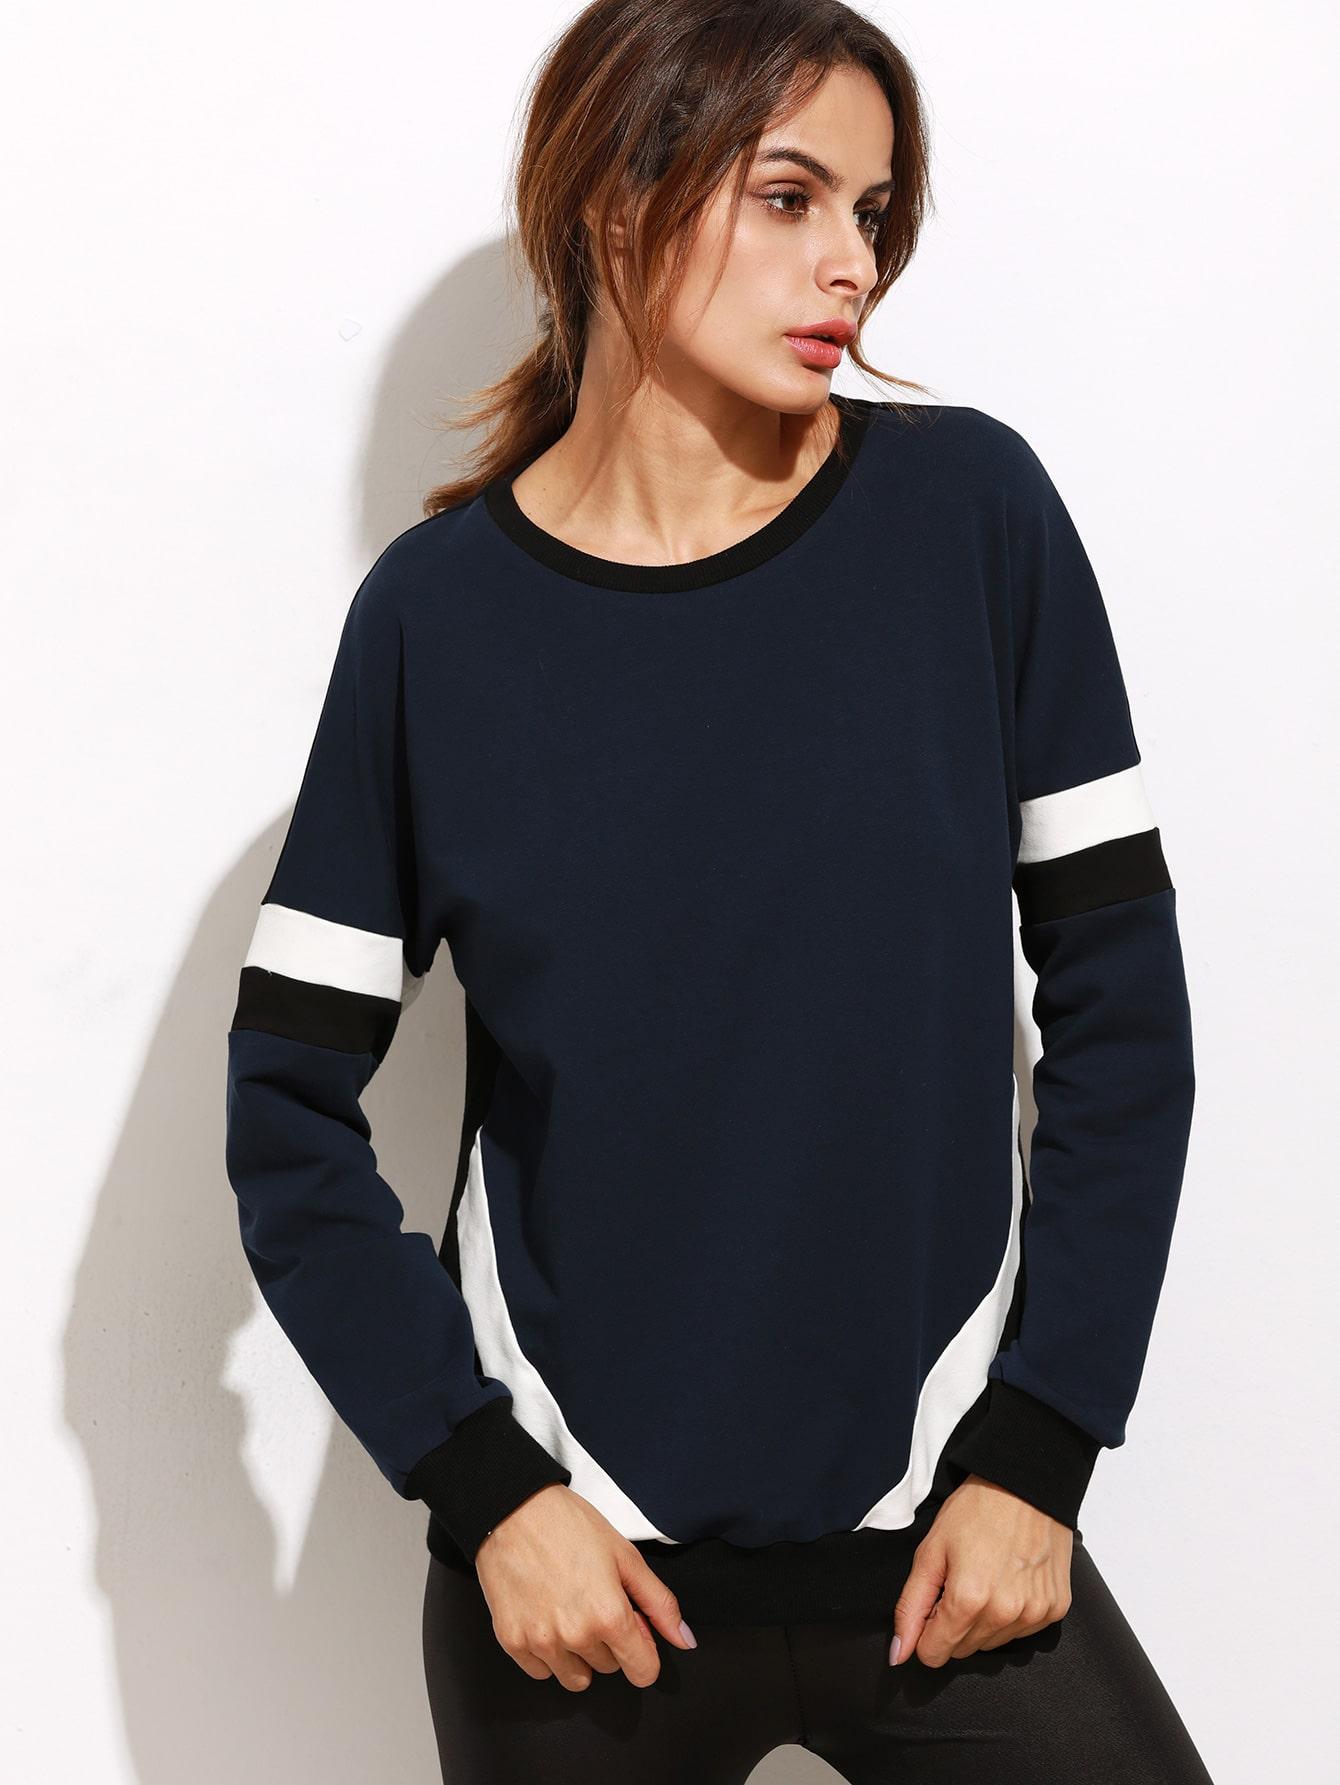 Color Block Ribbed Trim Sweatshirt sweatshirt160929703